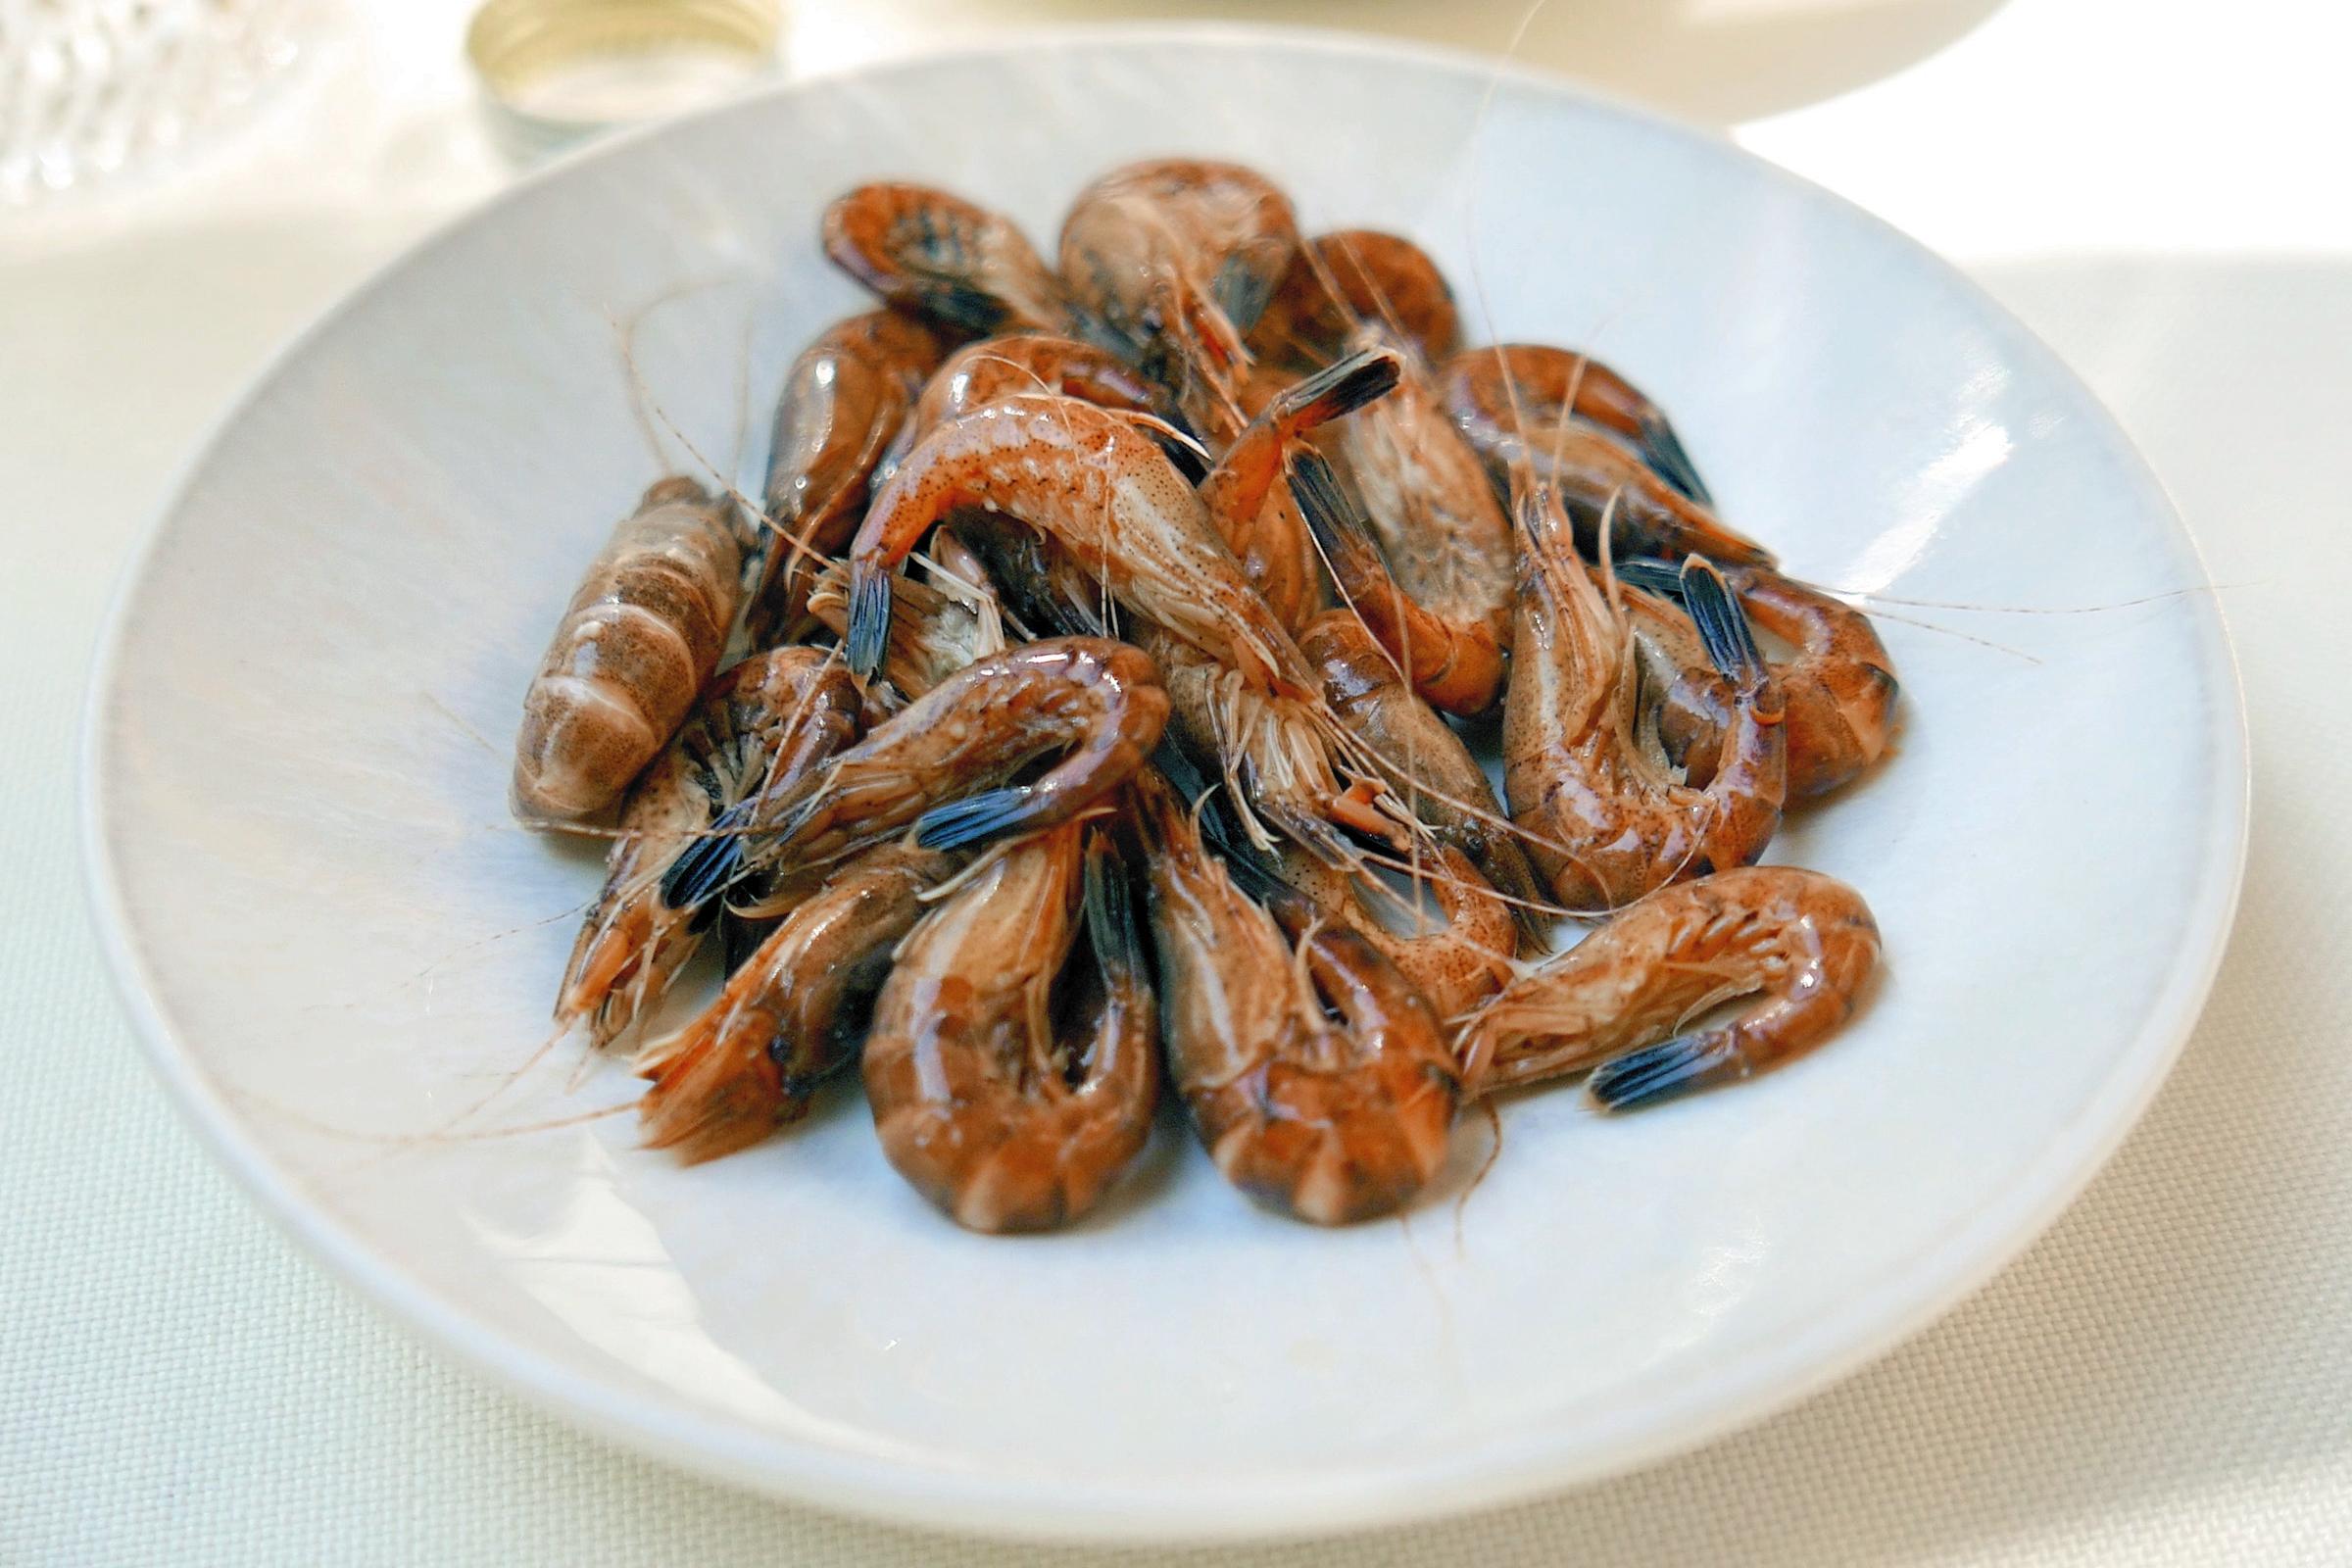 Nordseekrabbe (Lebensmittel) - Wikiwand